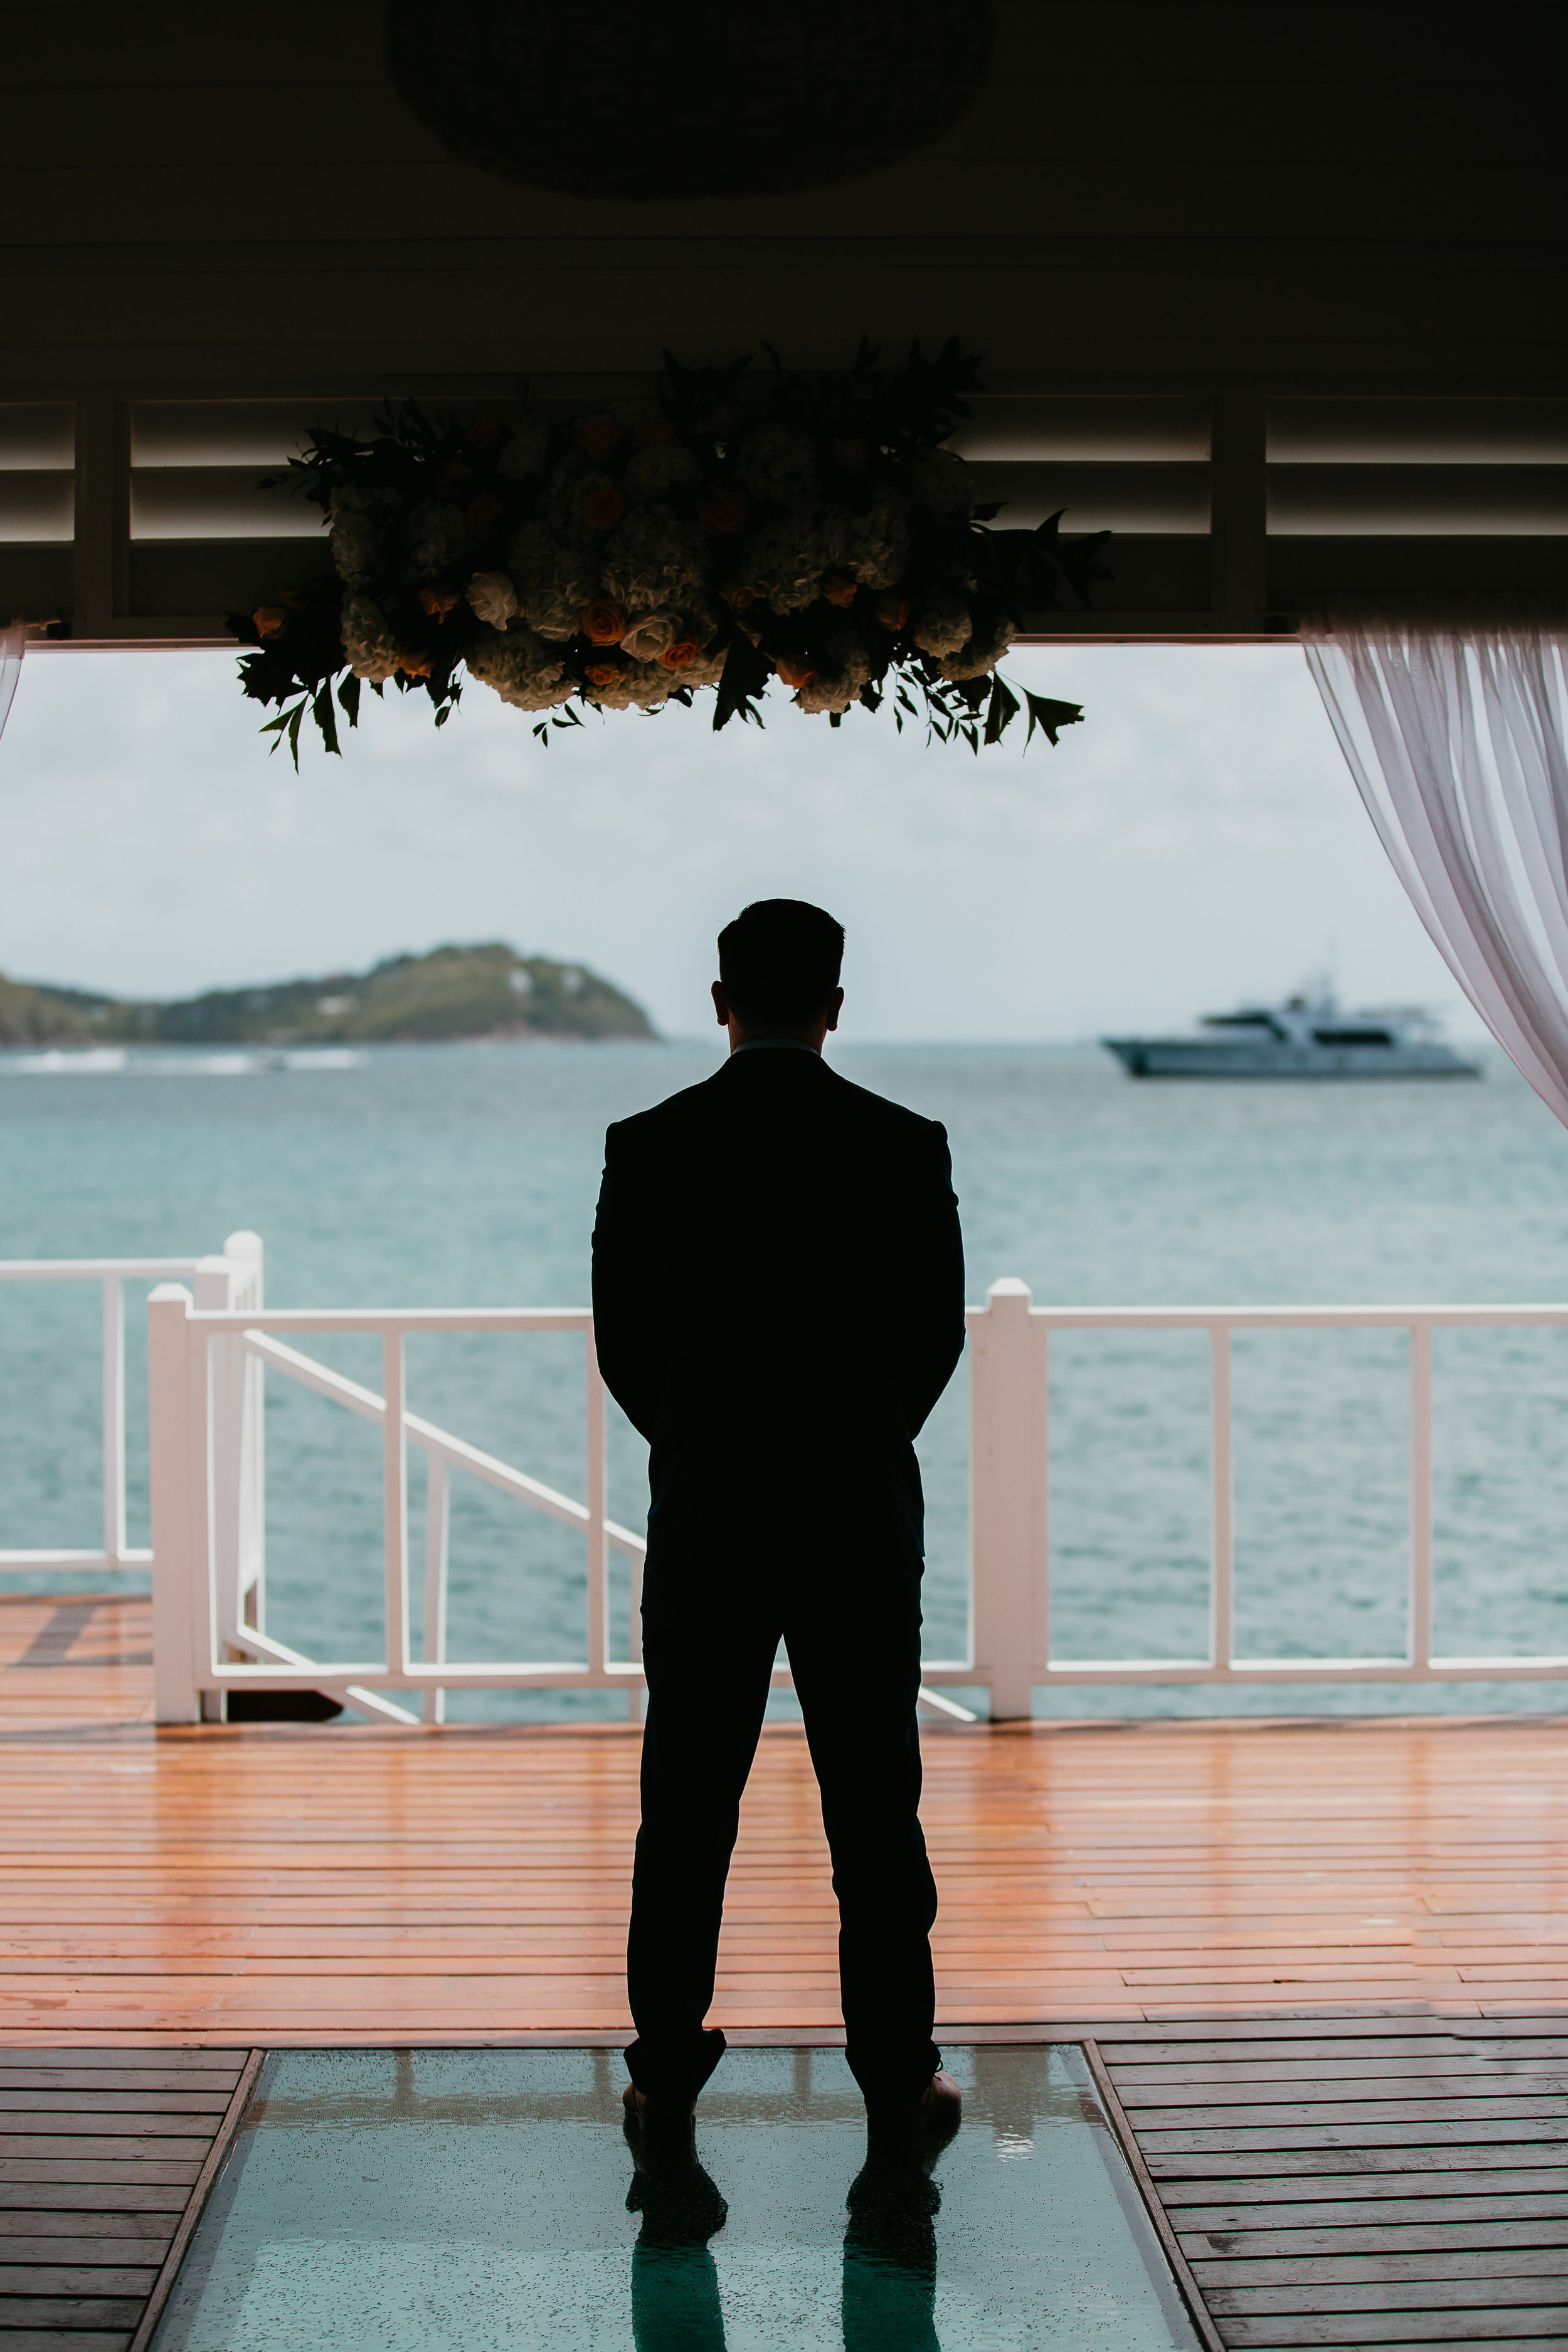 nicole-daacke-photography-destination-wedding-in-st-lucia-sandals-la-toc-intimate-island-wedding-carribean-elopement-photographer-chill-island-wedding-26.jpg